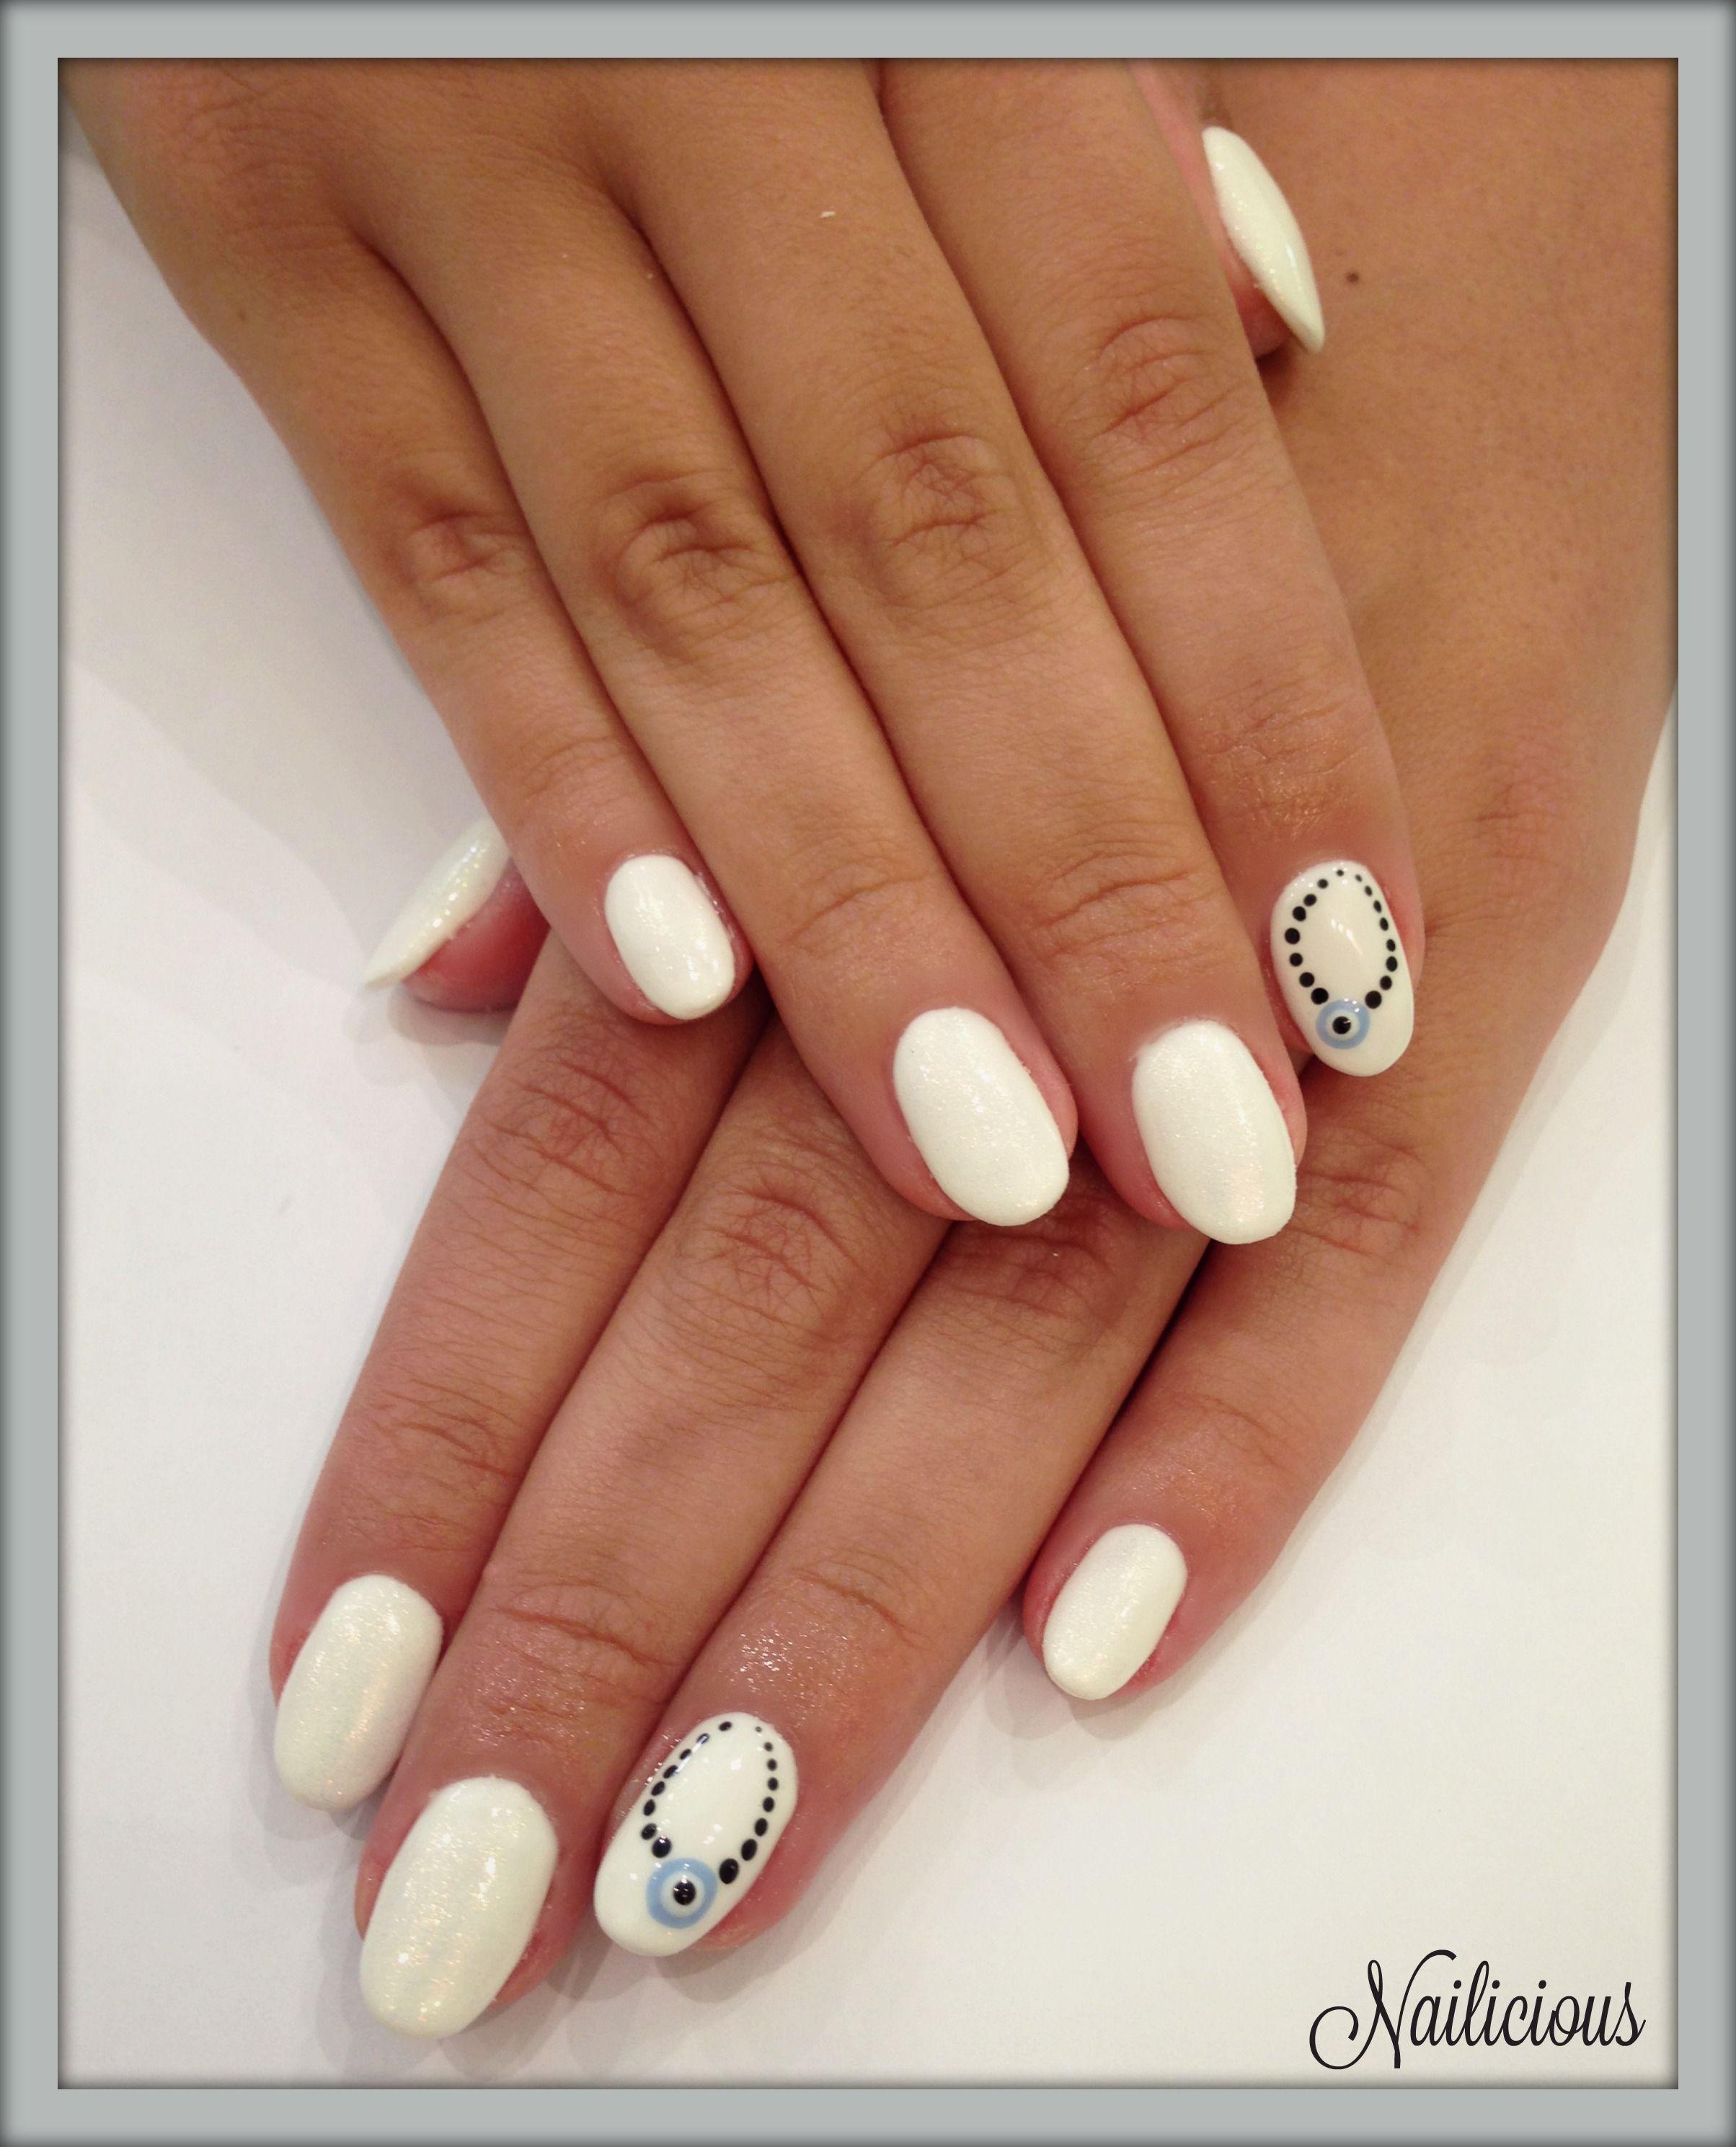 White nails with evil eye nail art | NAILICIOUS My Beauty Salon ...